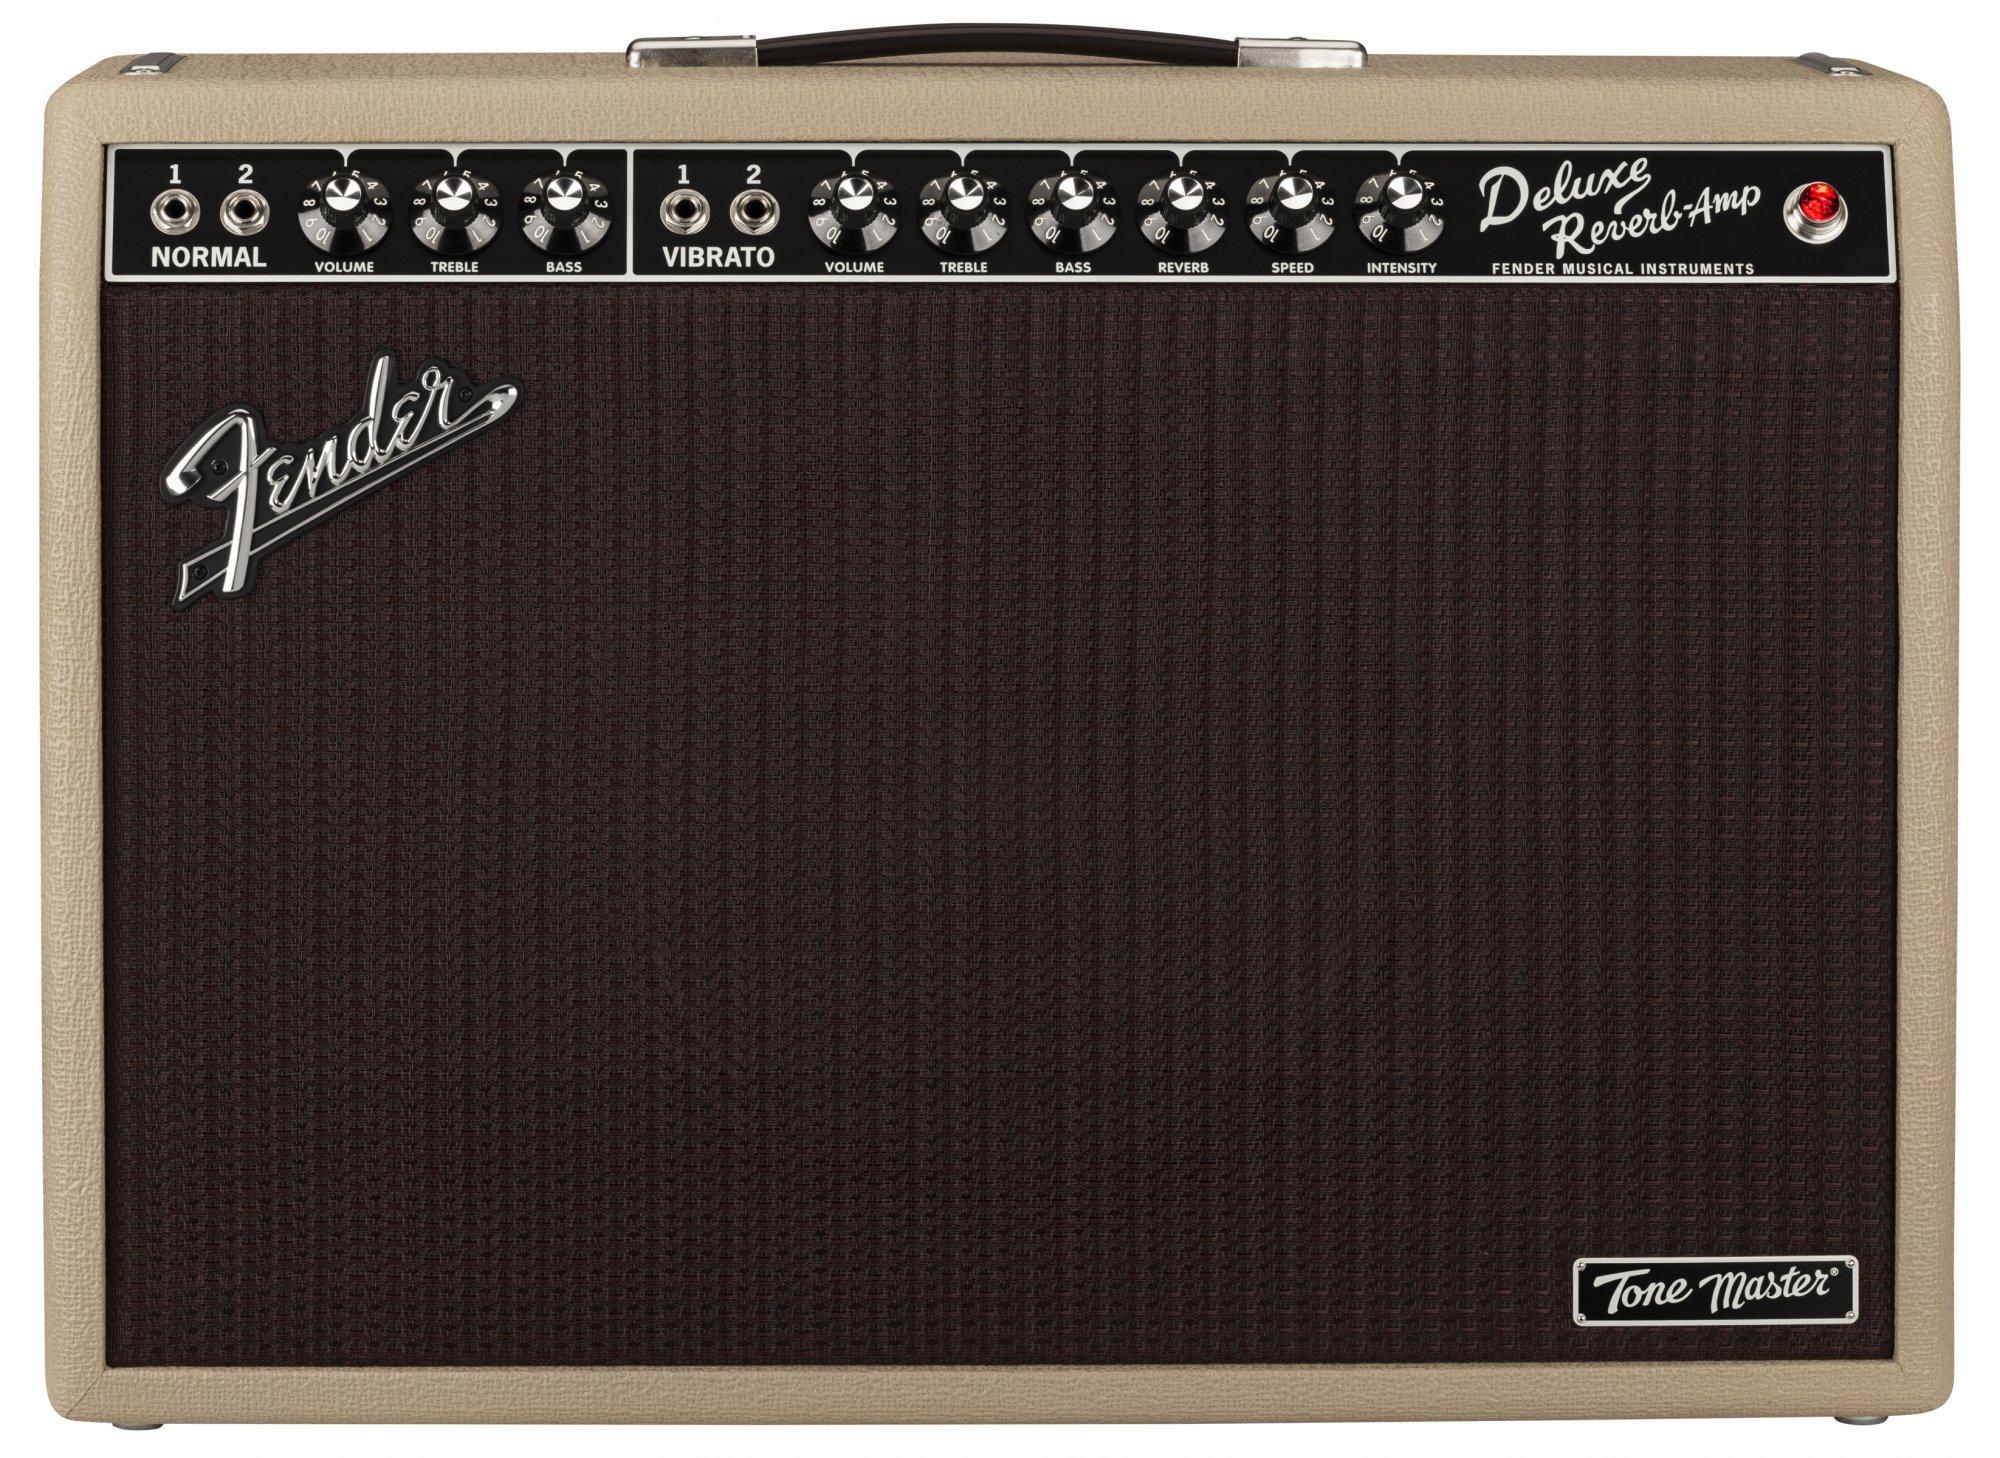 Fender Tone Master Deluxe Reverb Blonde 120V 1x12 Digital Guitar Combo Amp